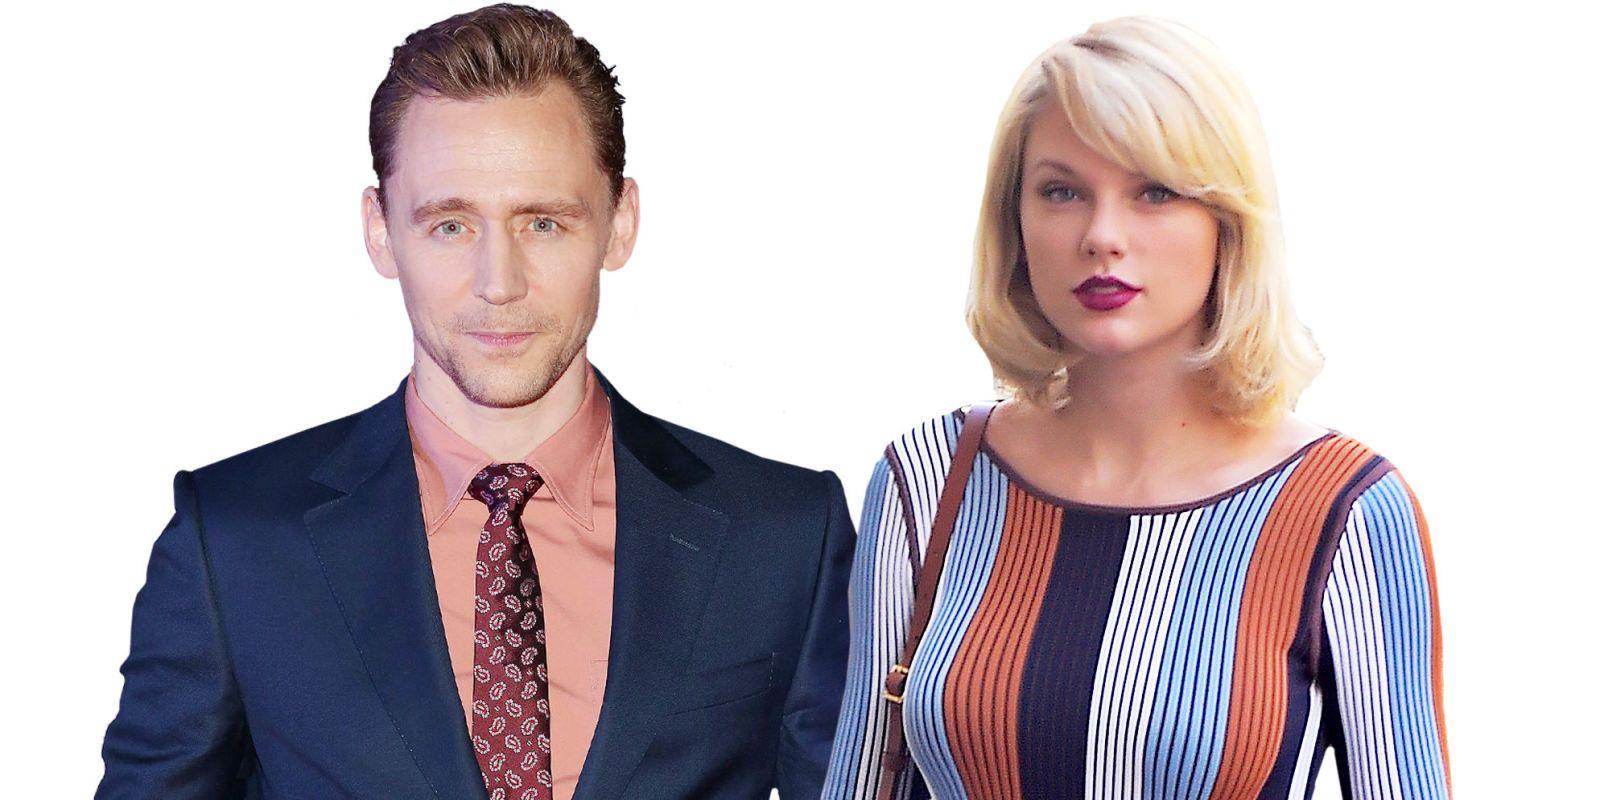 Tom hiddleston talks dating